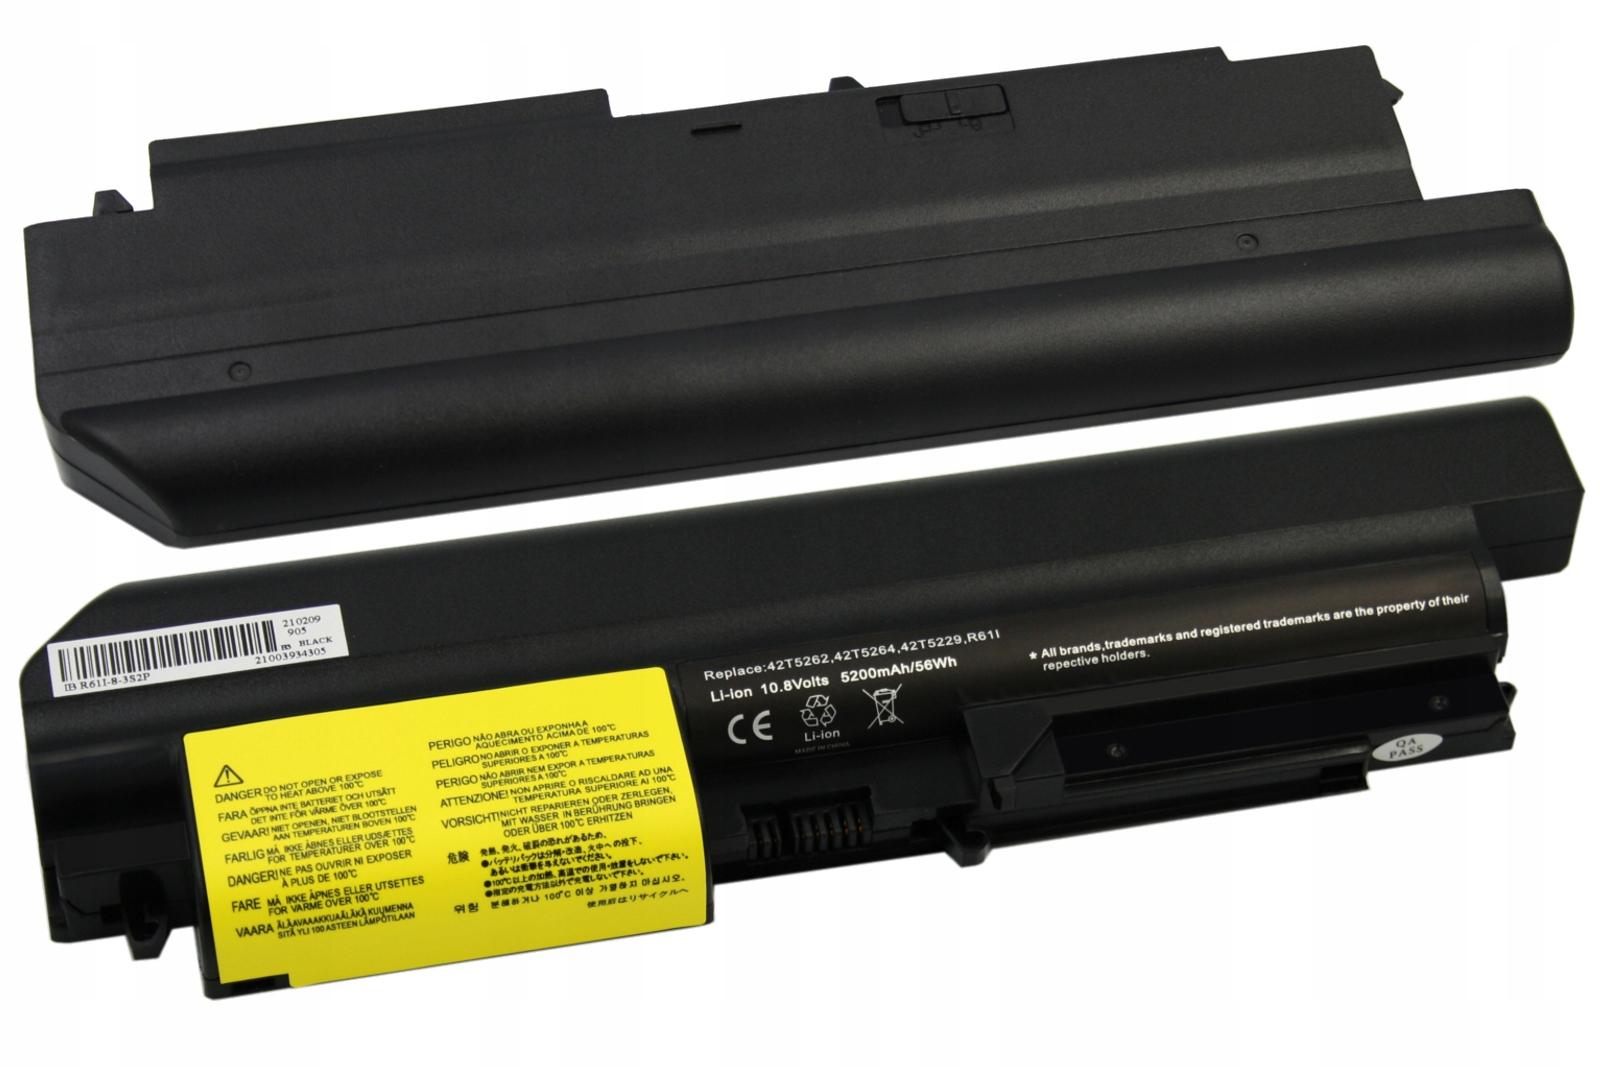 BATERIA AKUMULATOR LENOVO IBM T61P R61I T400 R400 42T5225 - Baterie do laptopów